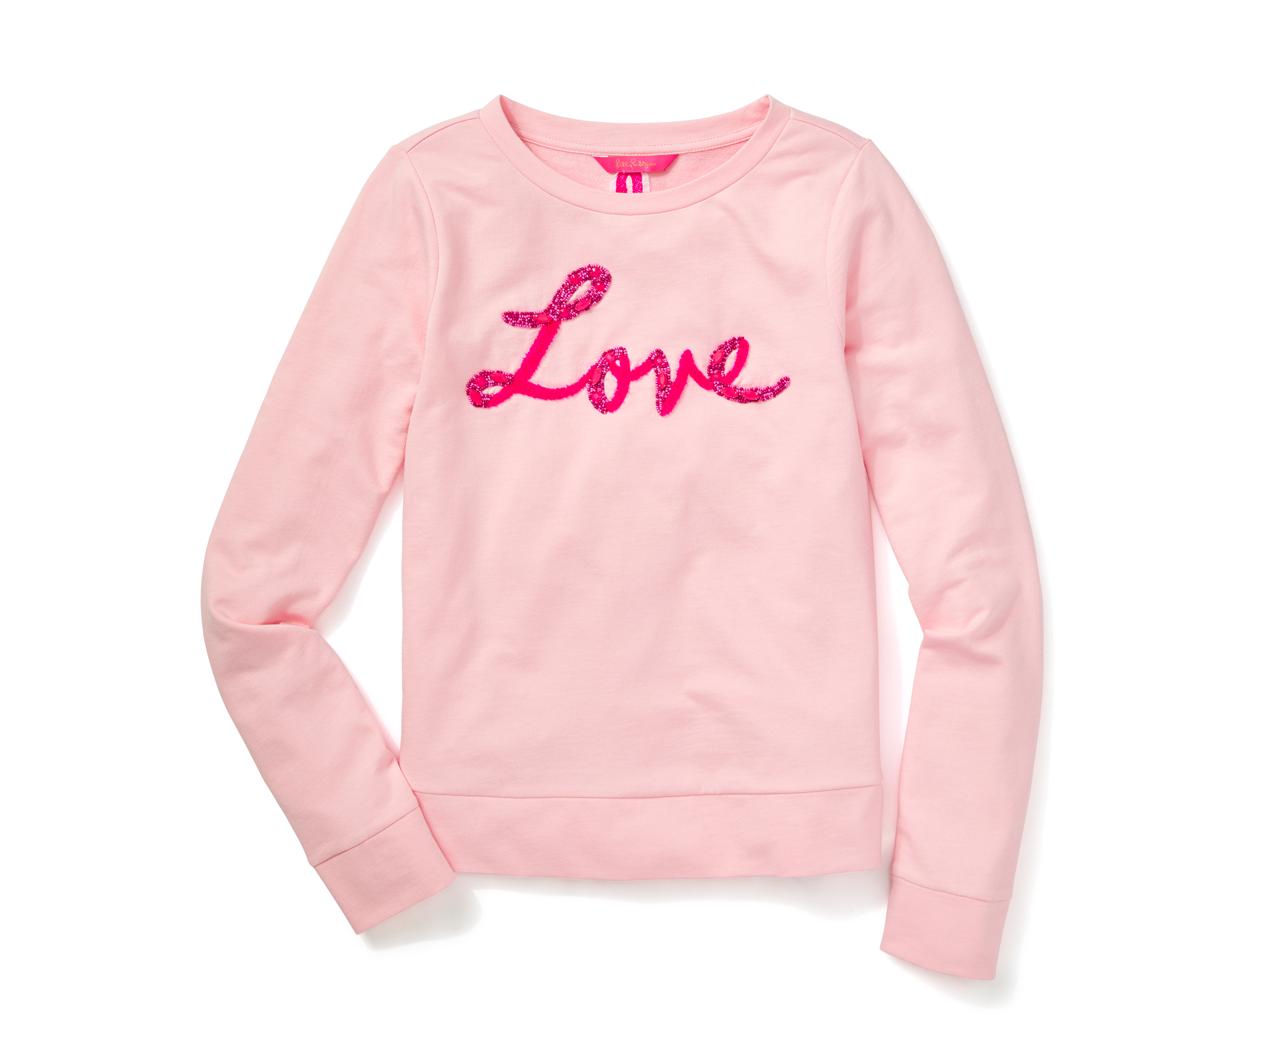 LillyPulitzer_BCRFShopPink2021_RamiLoveSweatshirt#1.png